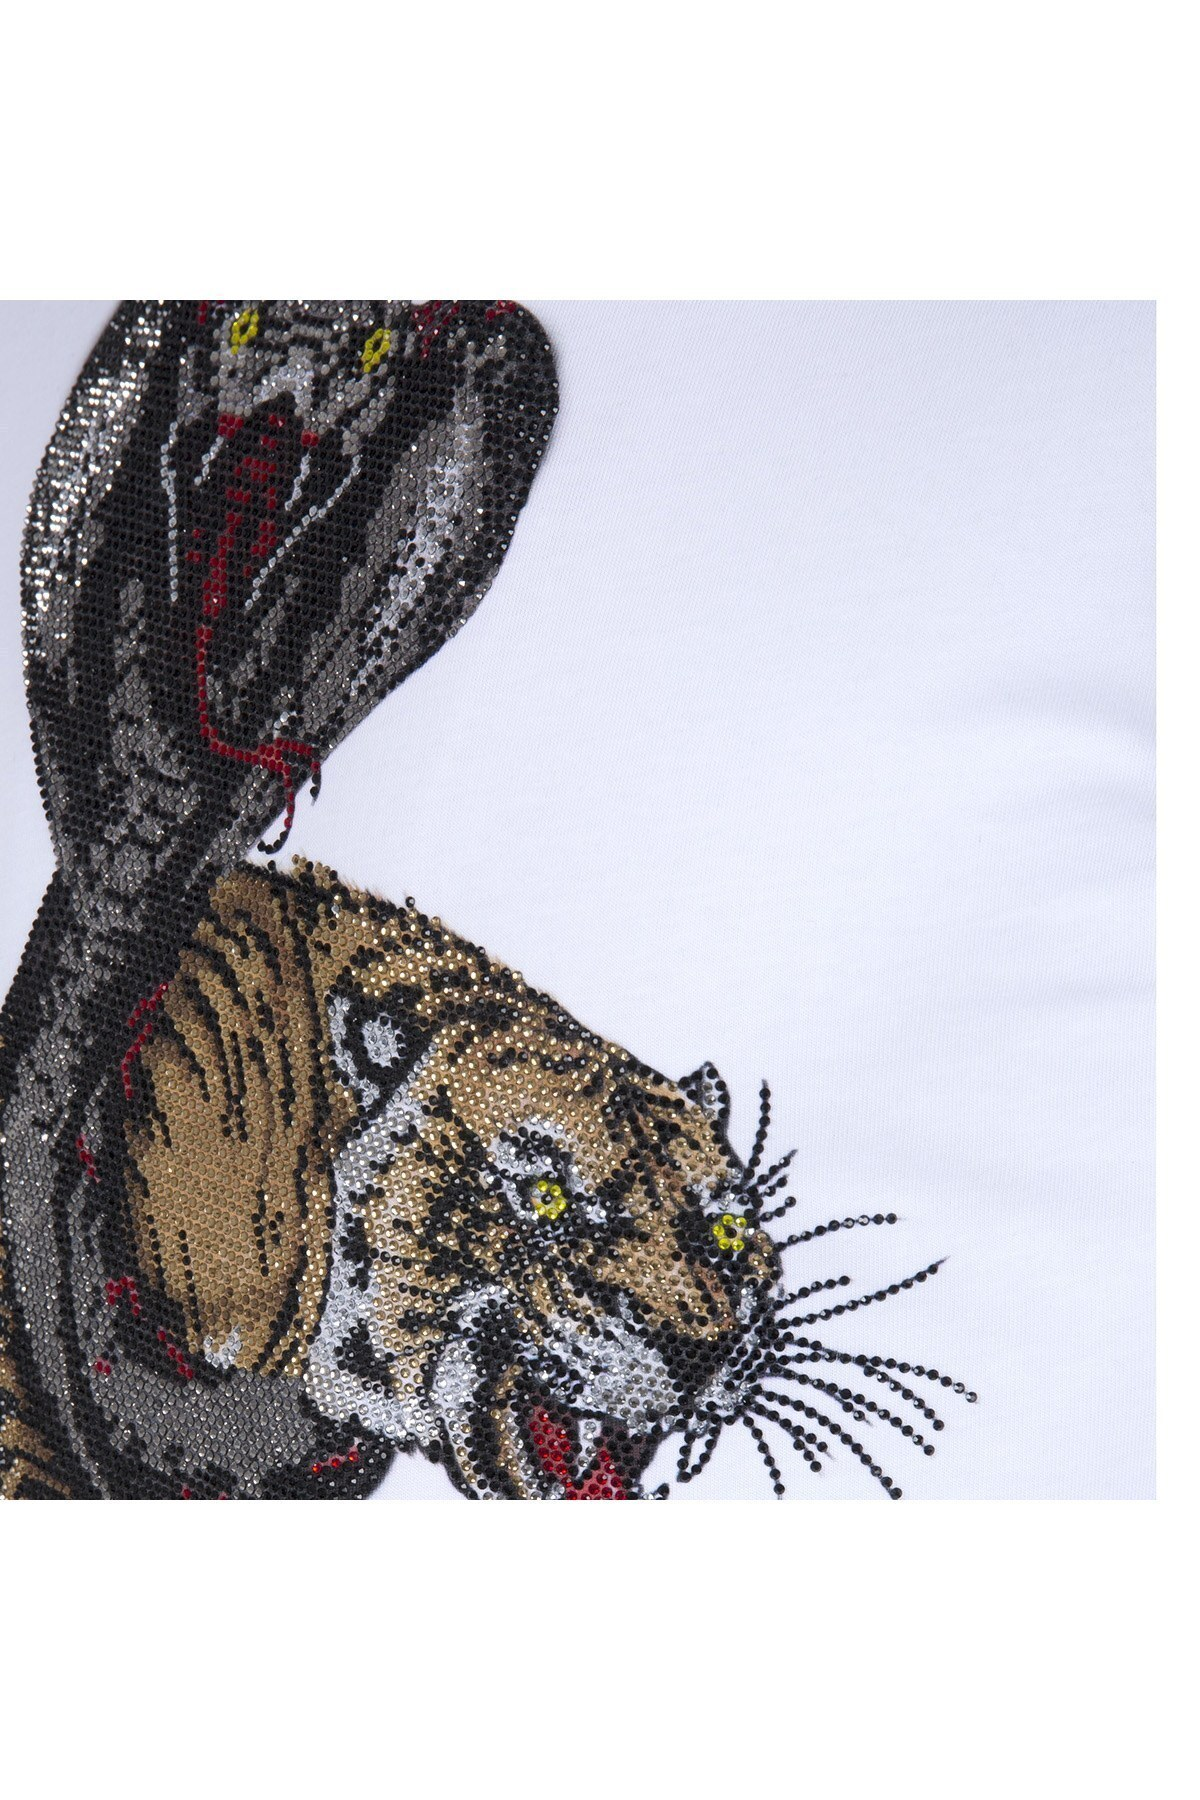 PHILIPP PLEIN T SHIRT Erkek T Shirt P18C MTK1936 PJY002N 01 BEYAZ